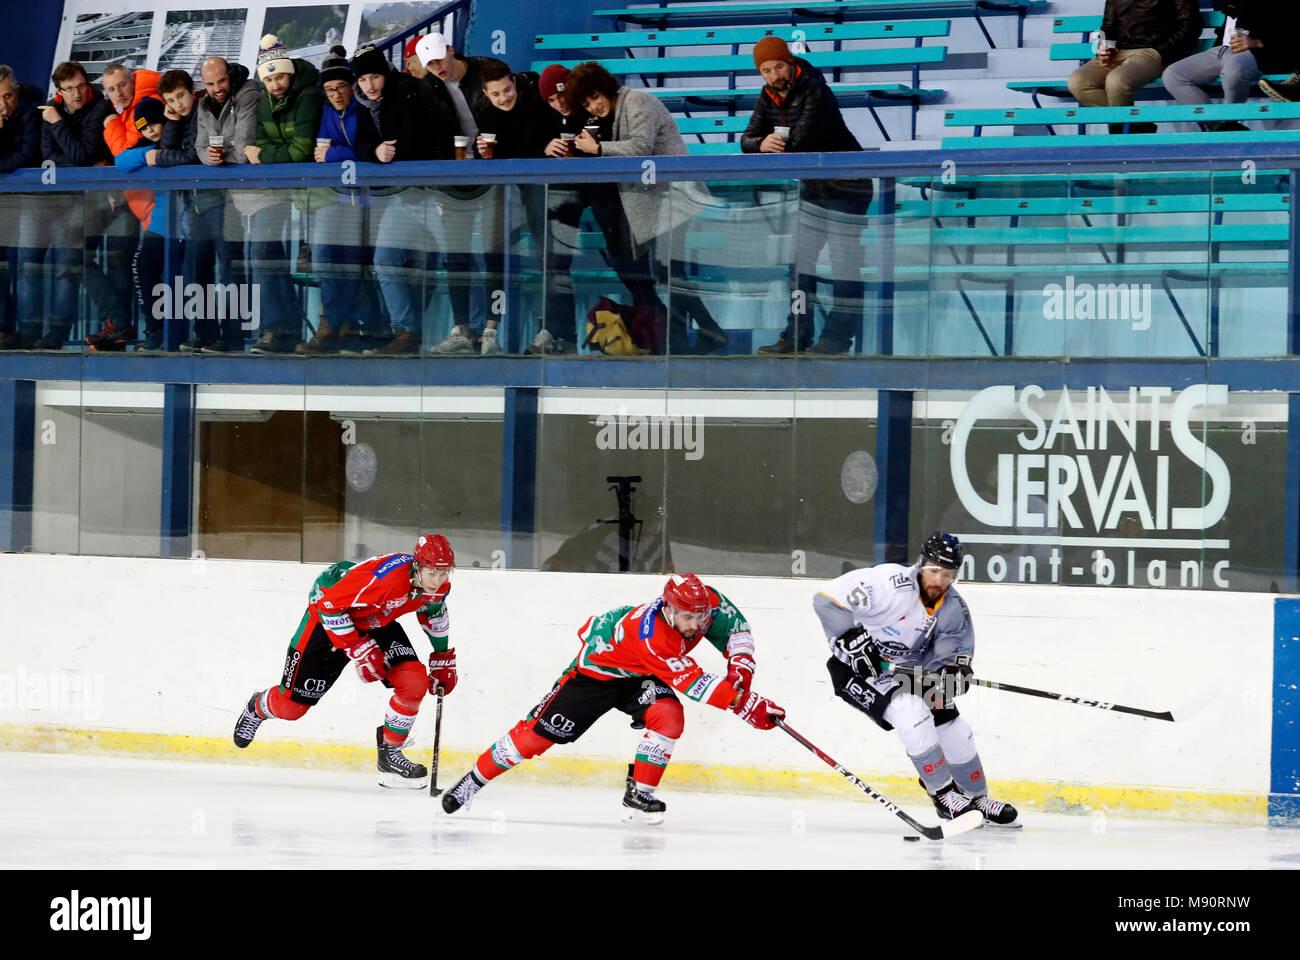 Ice Hockey.  Hockey team.  HC Mont-Blanc. - Stock Image